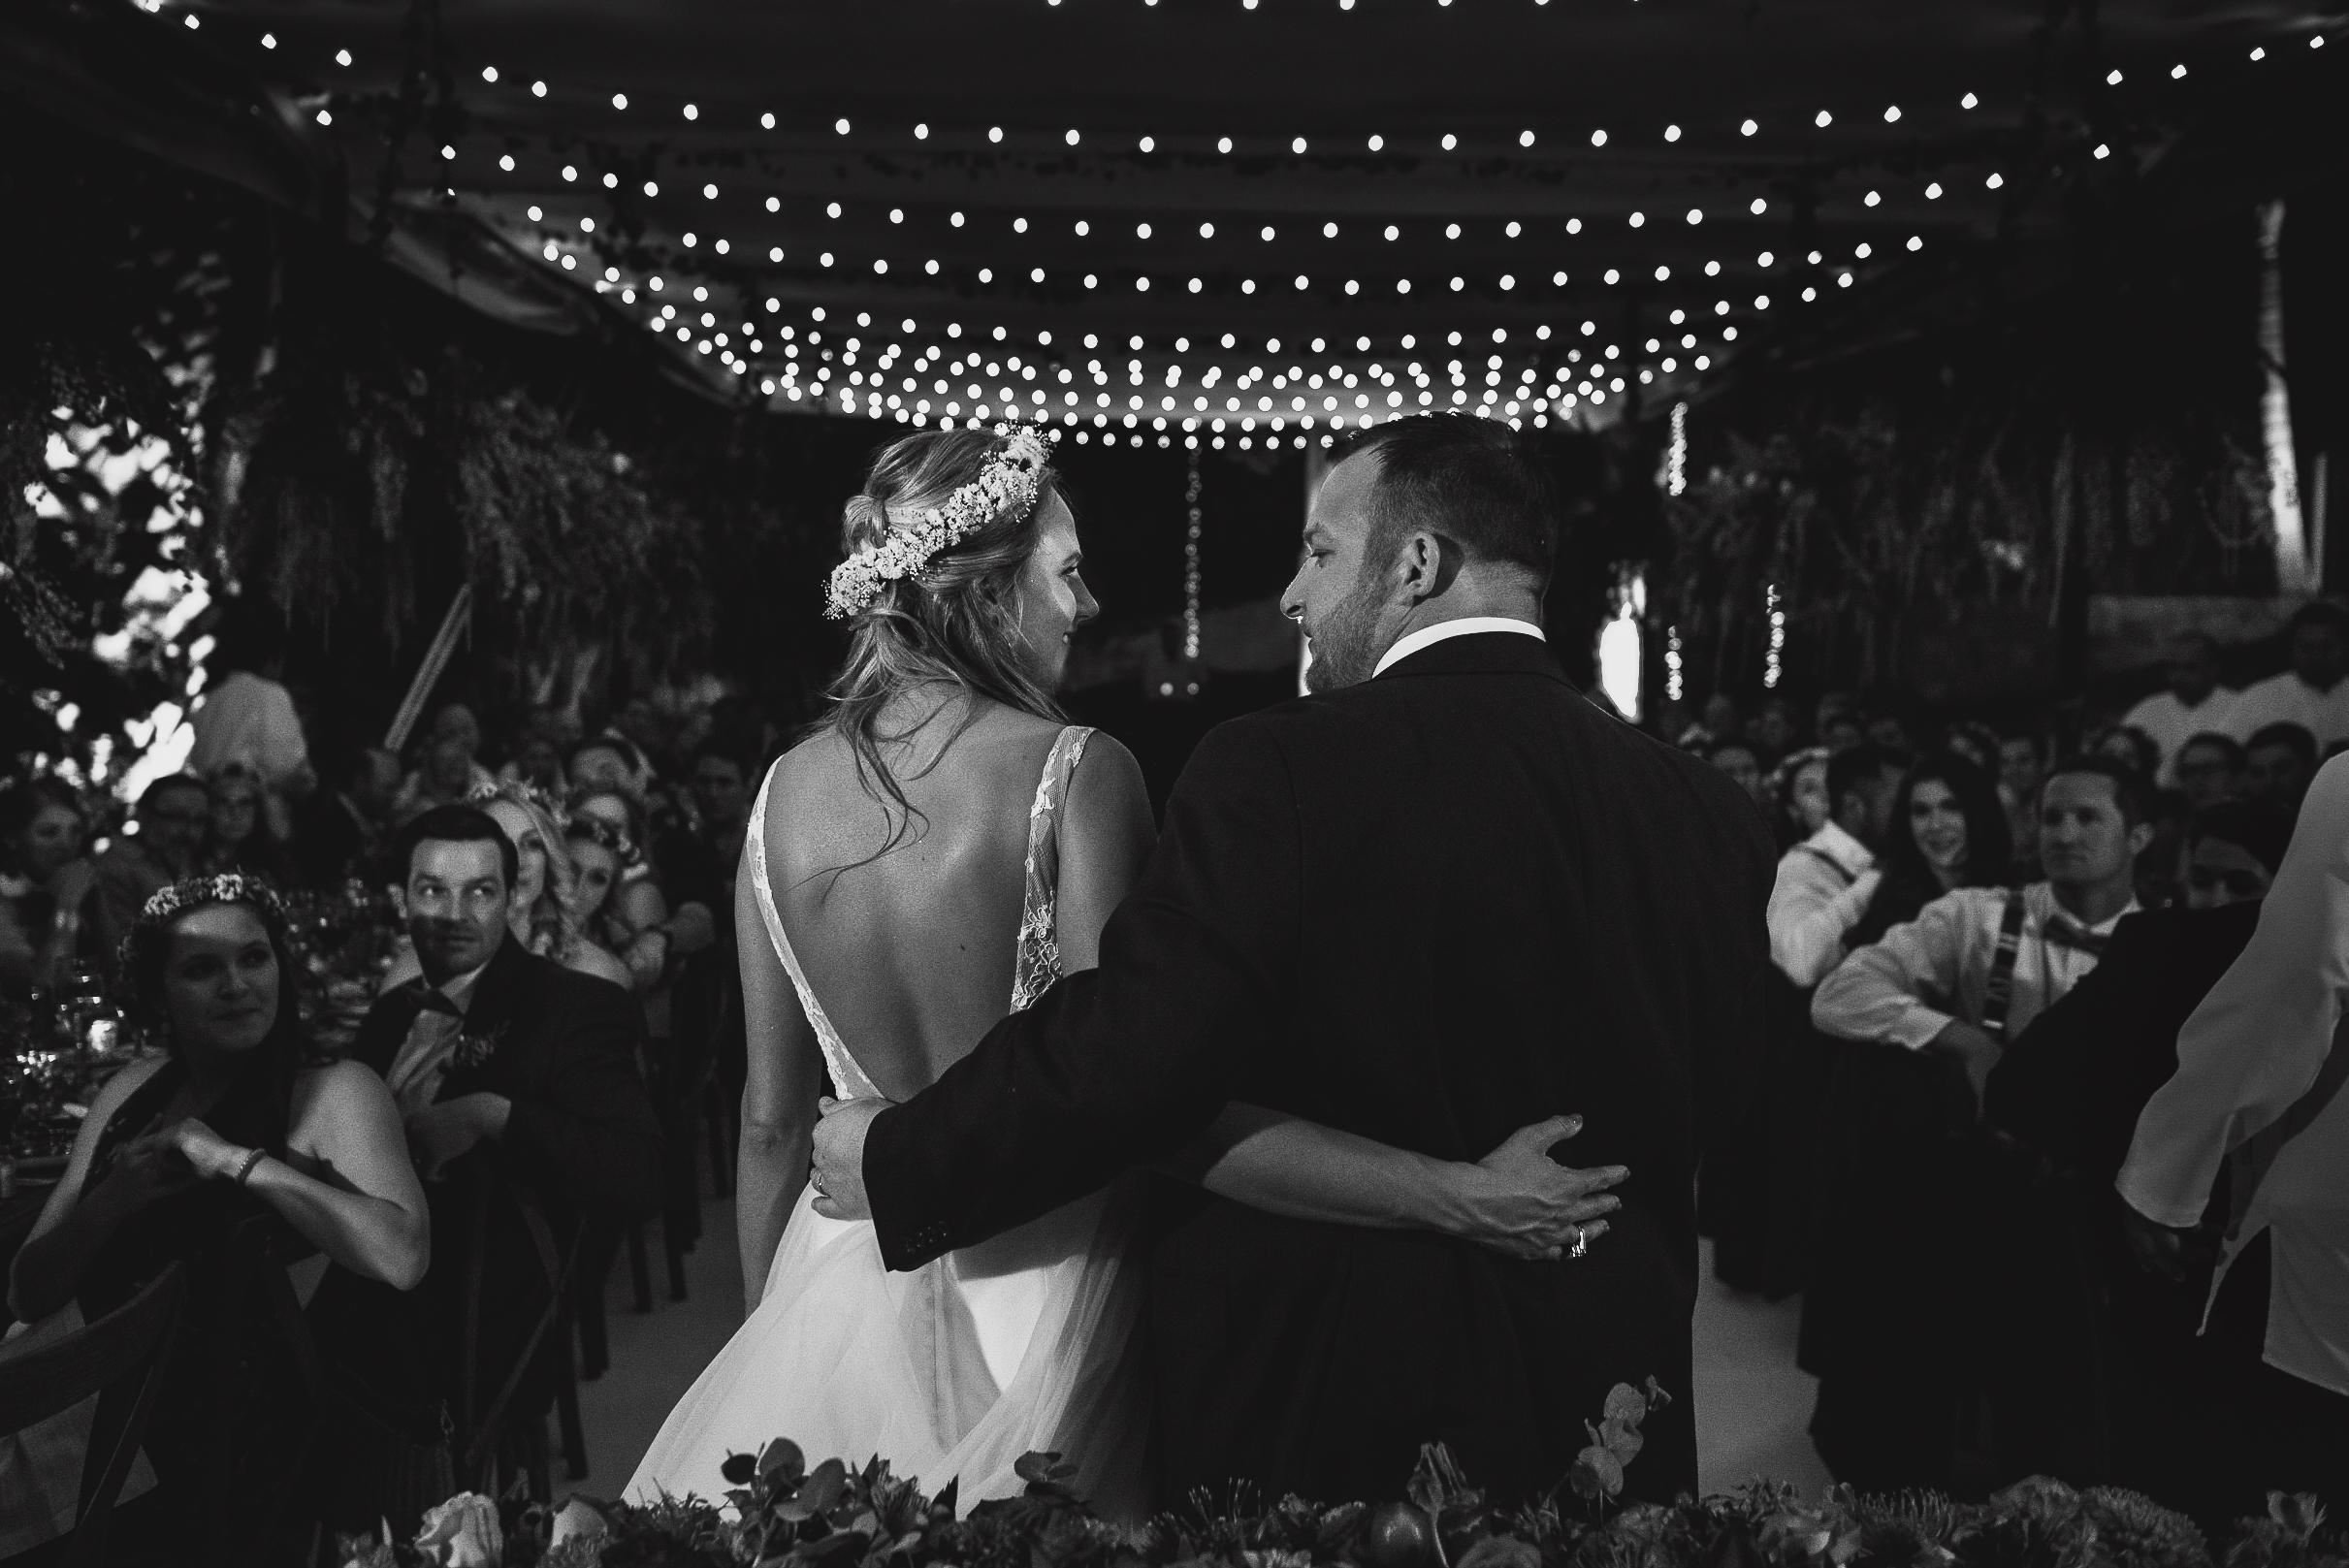 casa_chorro_wedding_san_miguel_de_allende_chio_garcia_photographer (26).jpg